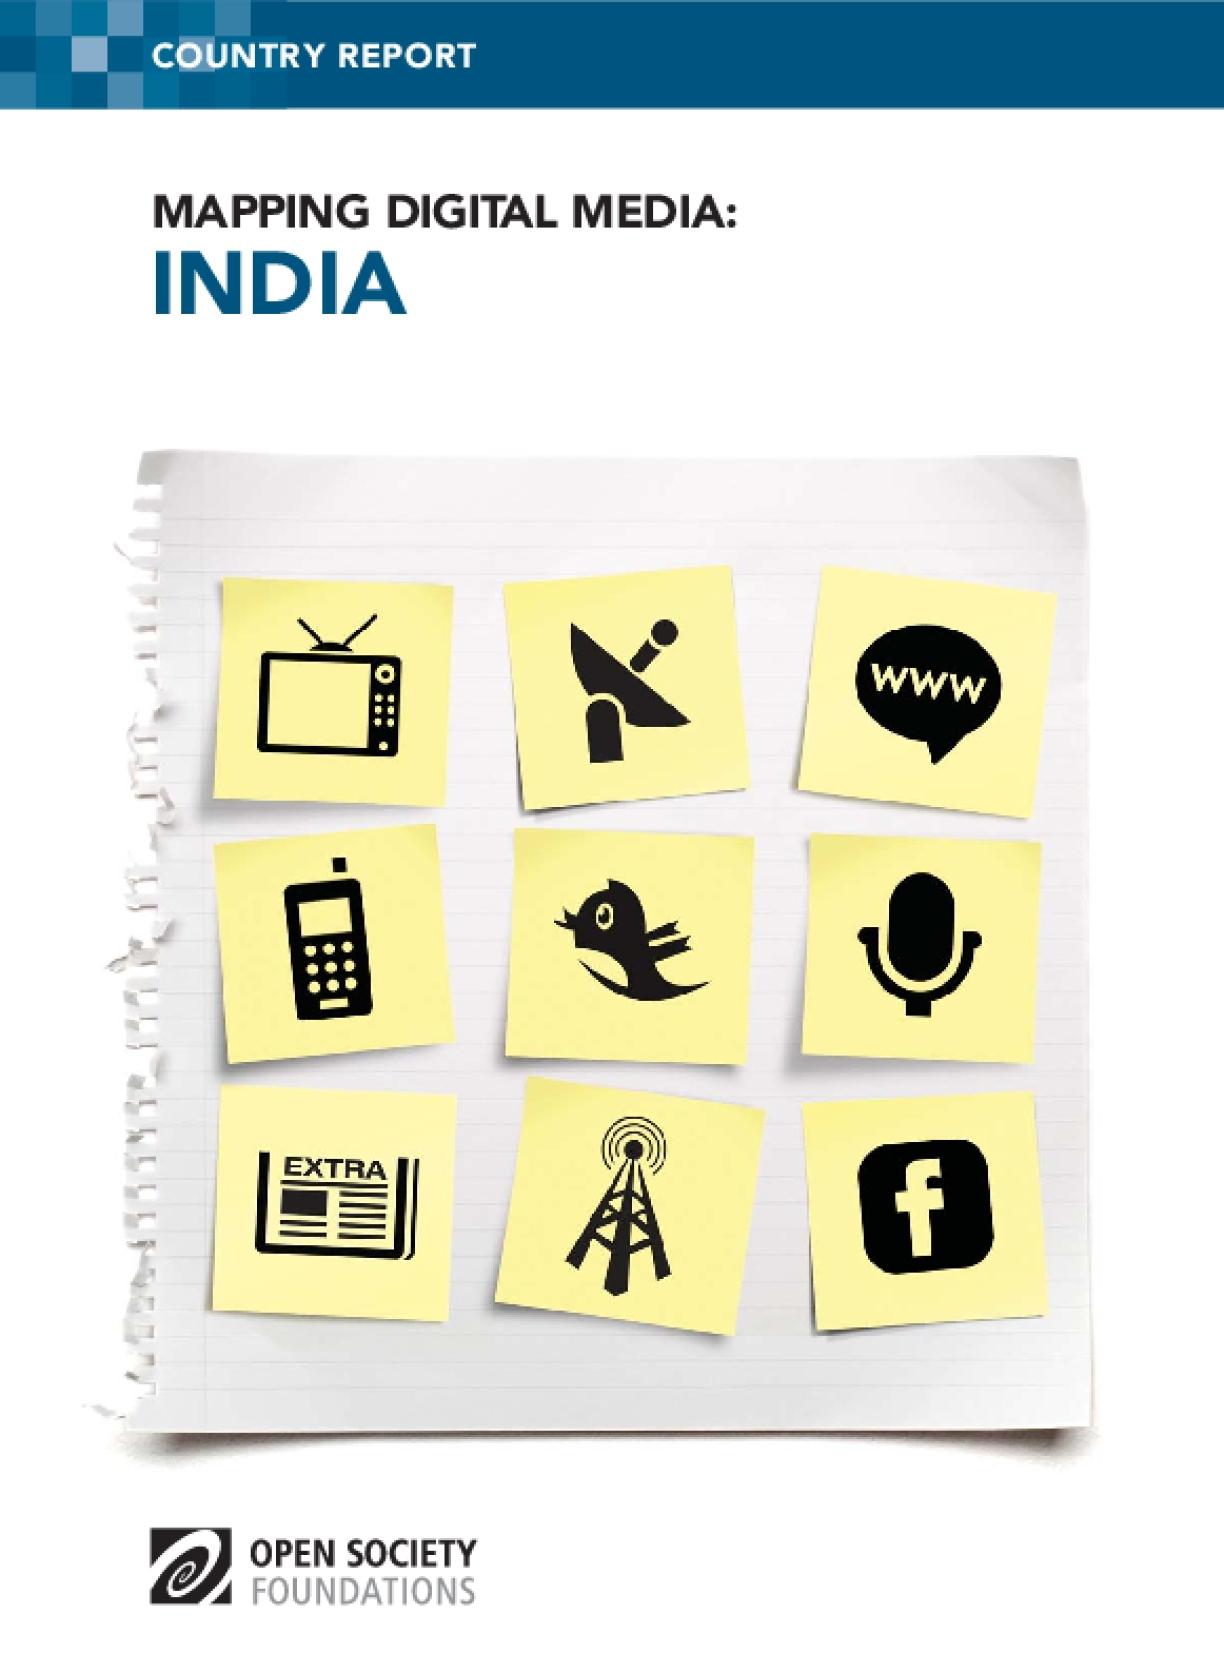 Mapping Digital Media: India